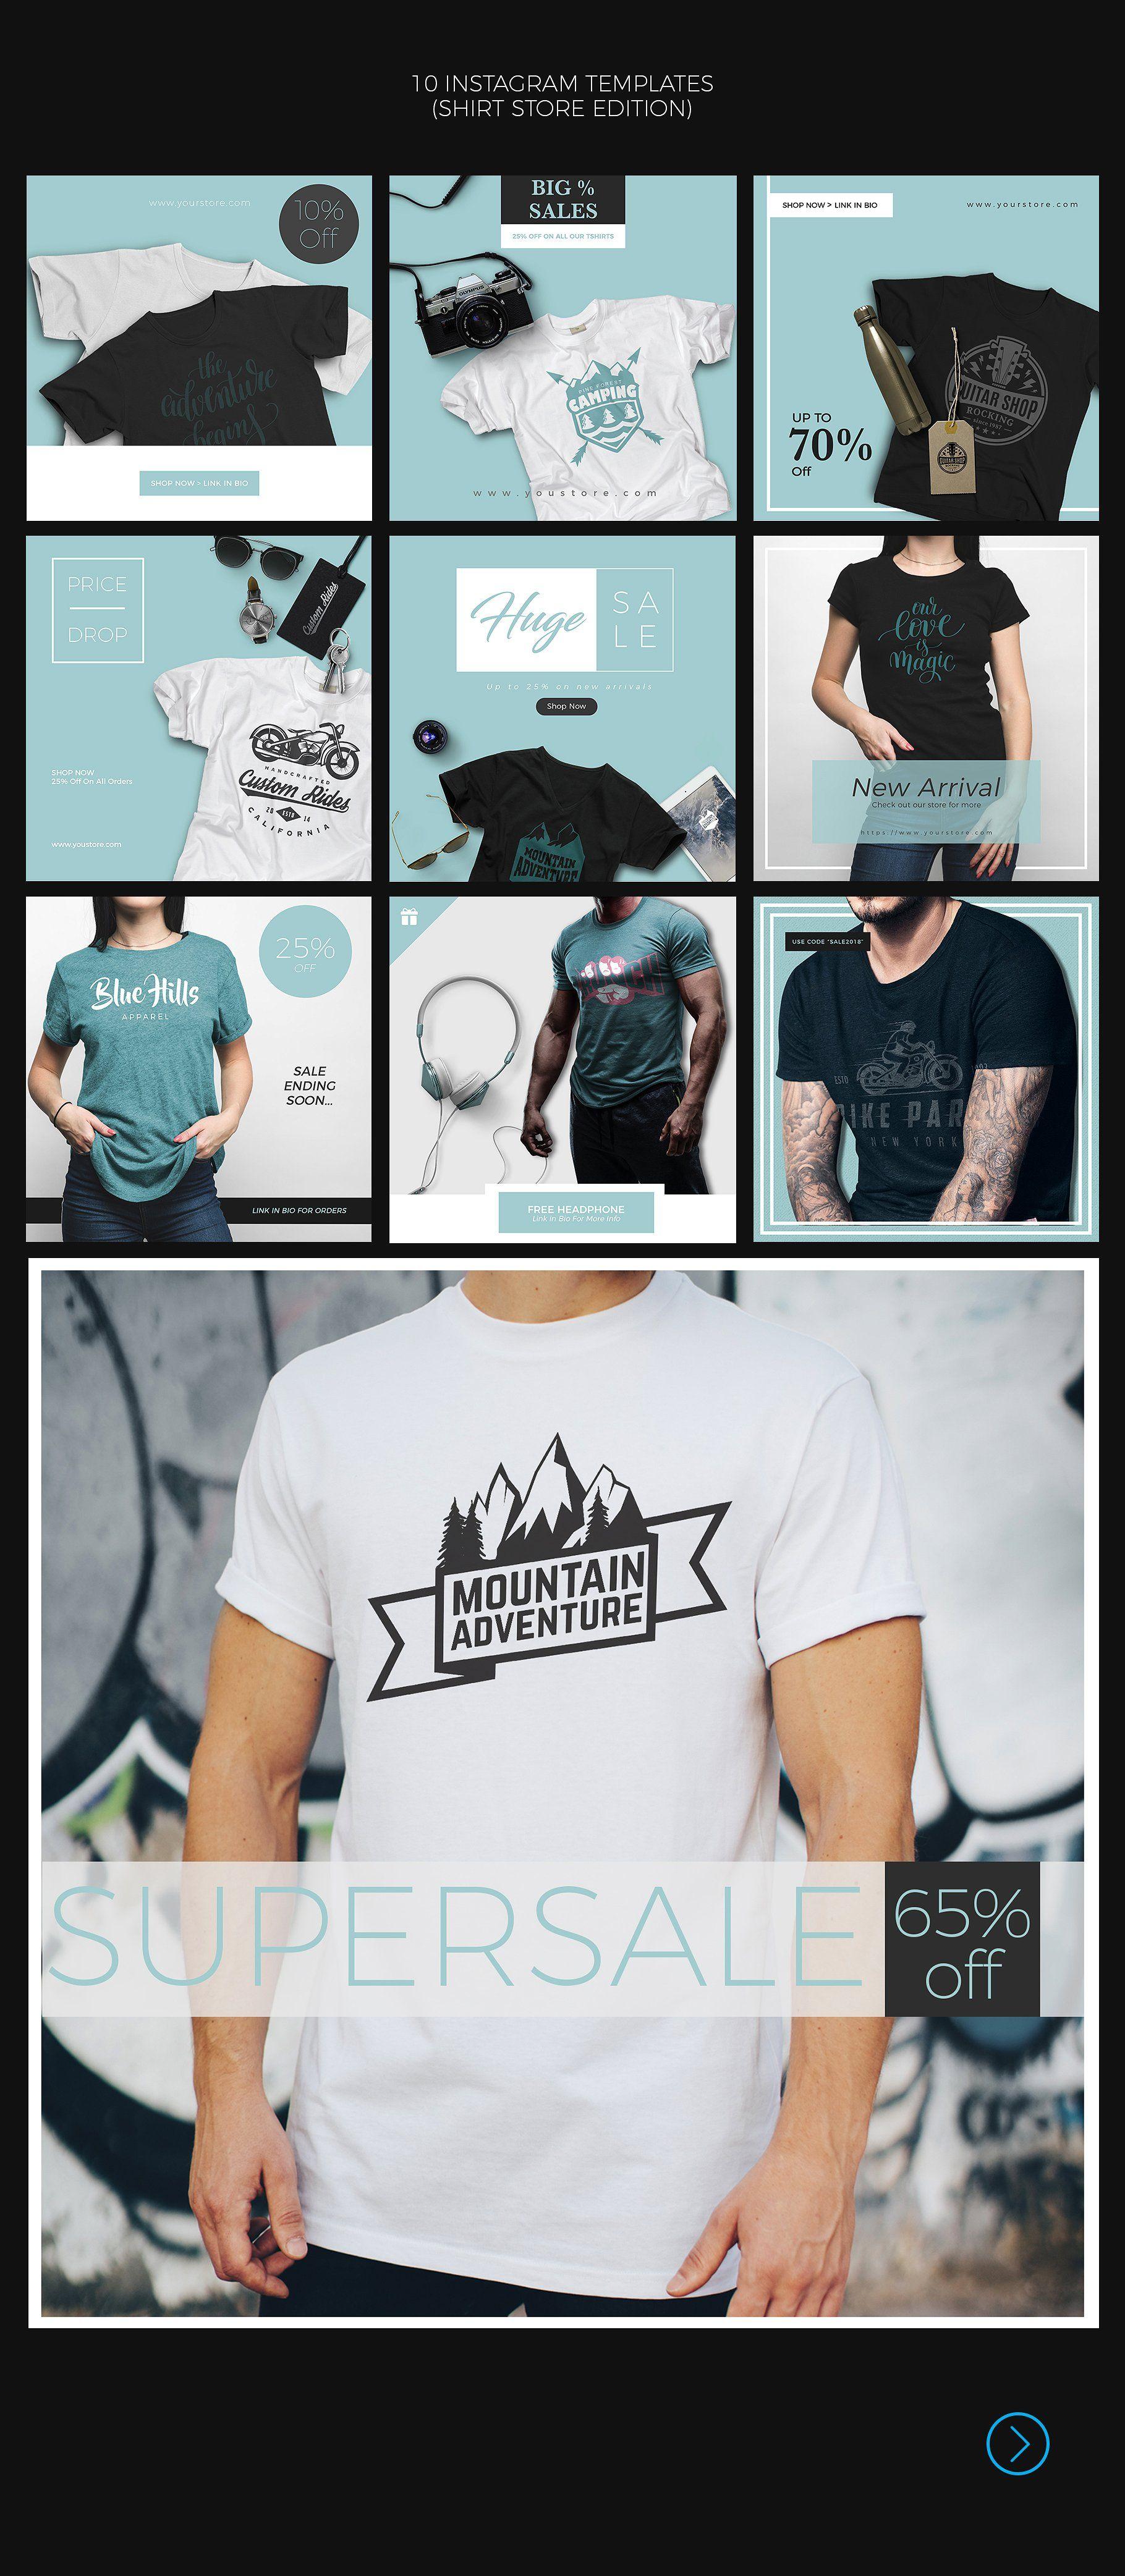 Download The Essential Tshirt Mockup Bundle Clothing Mockup Instagram Outfits Shirt Mockup